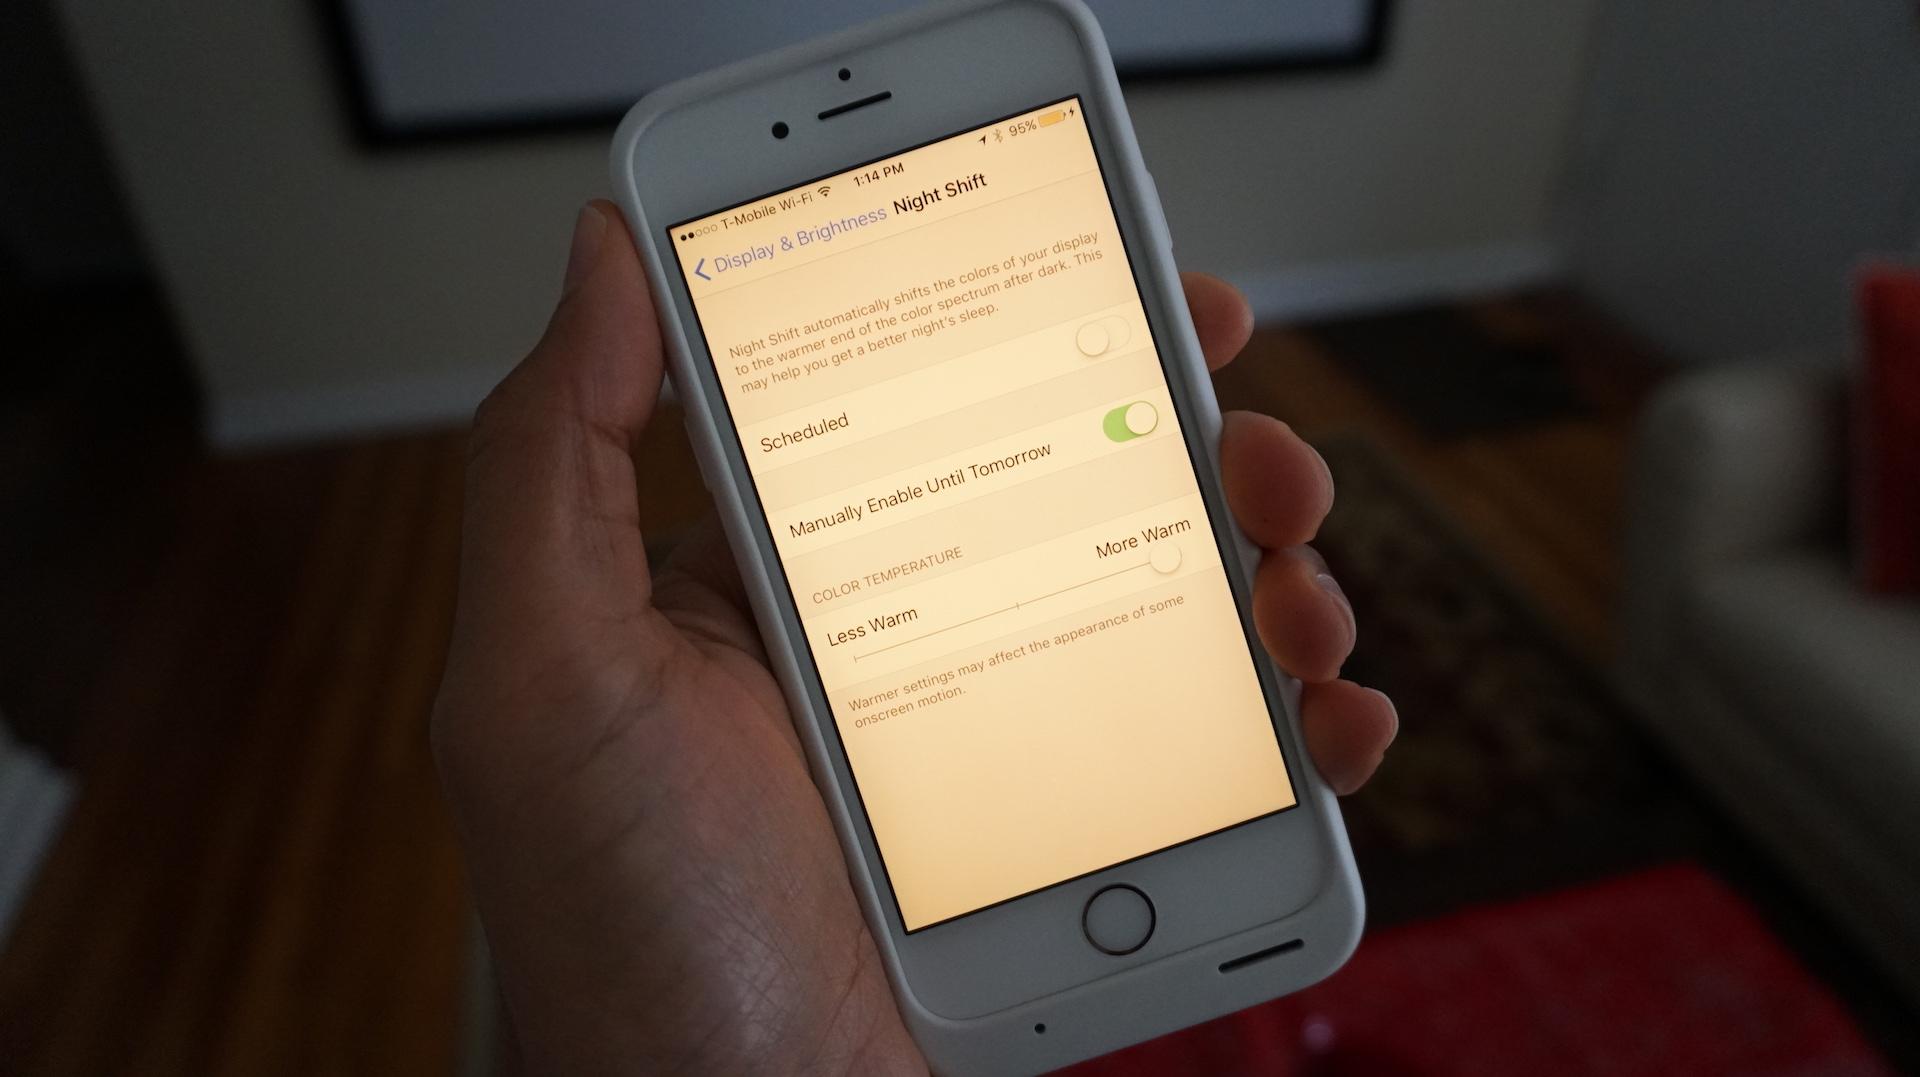 Low Power Mode Night Shift iOS 9.3.2 beta 2